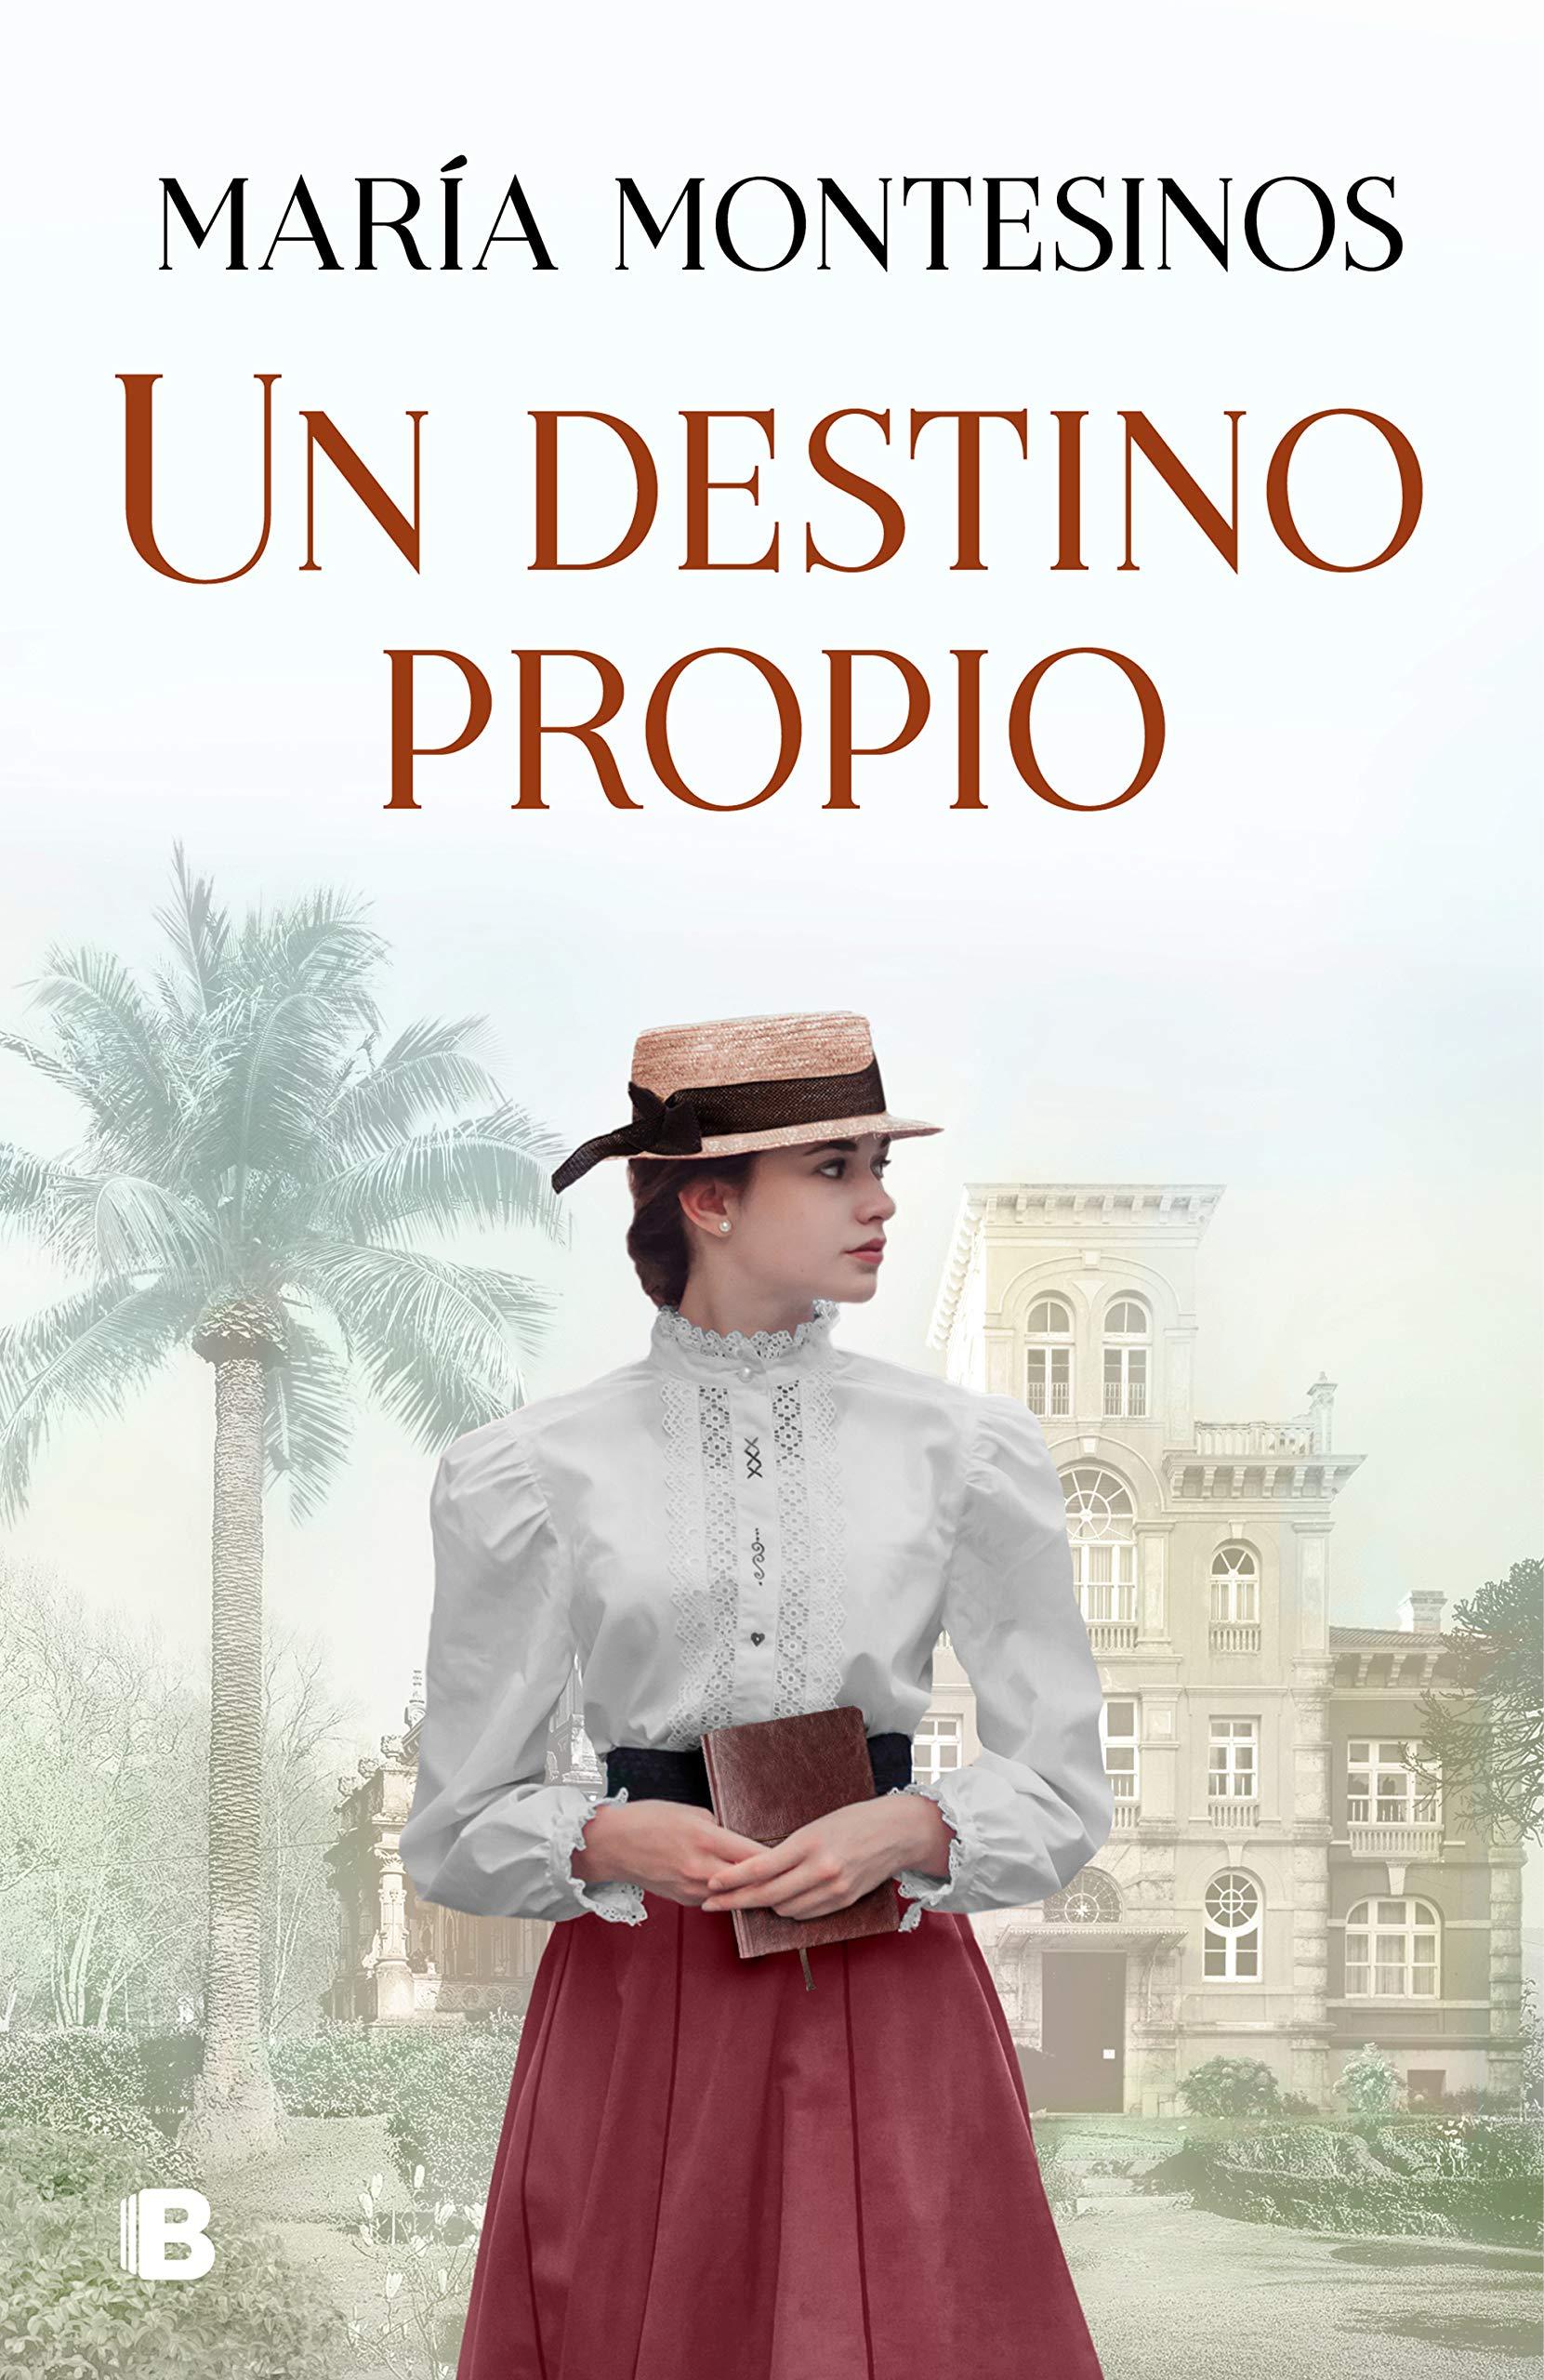 Un destino propio by María Montesinos